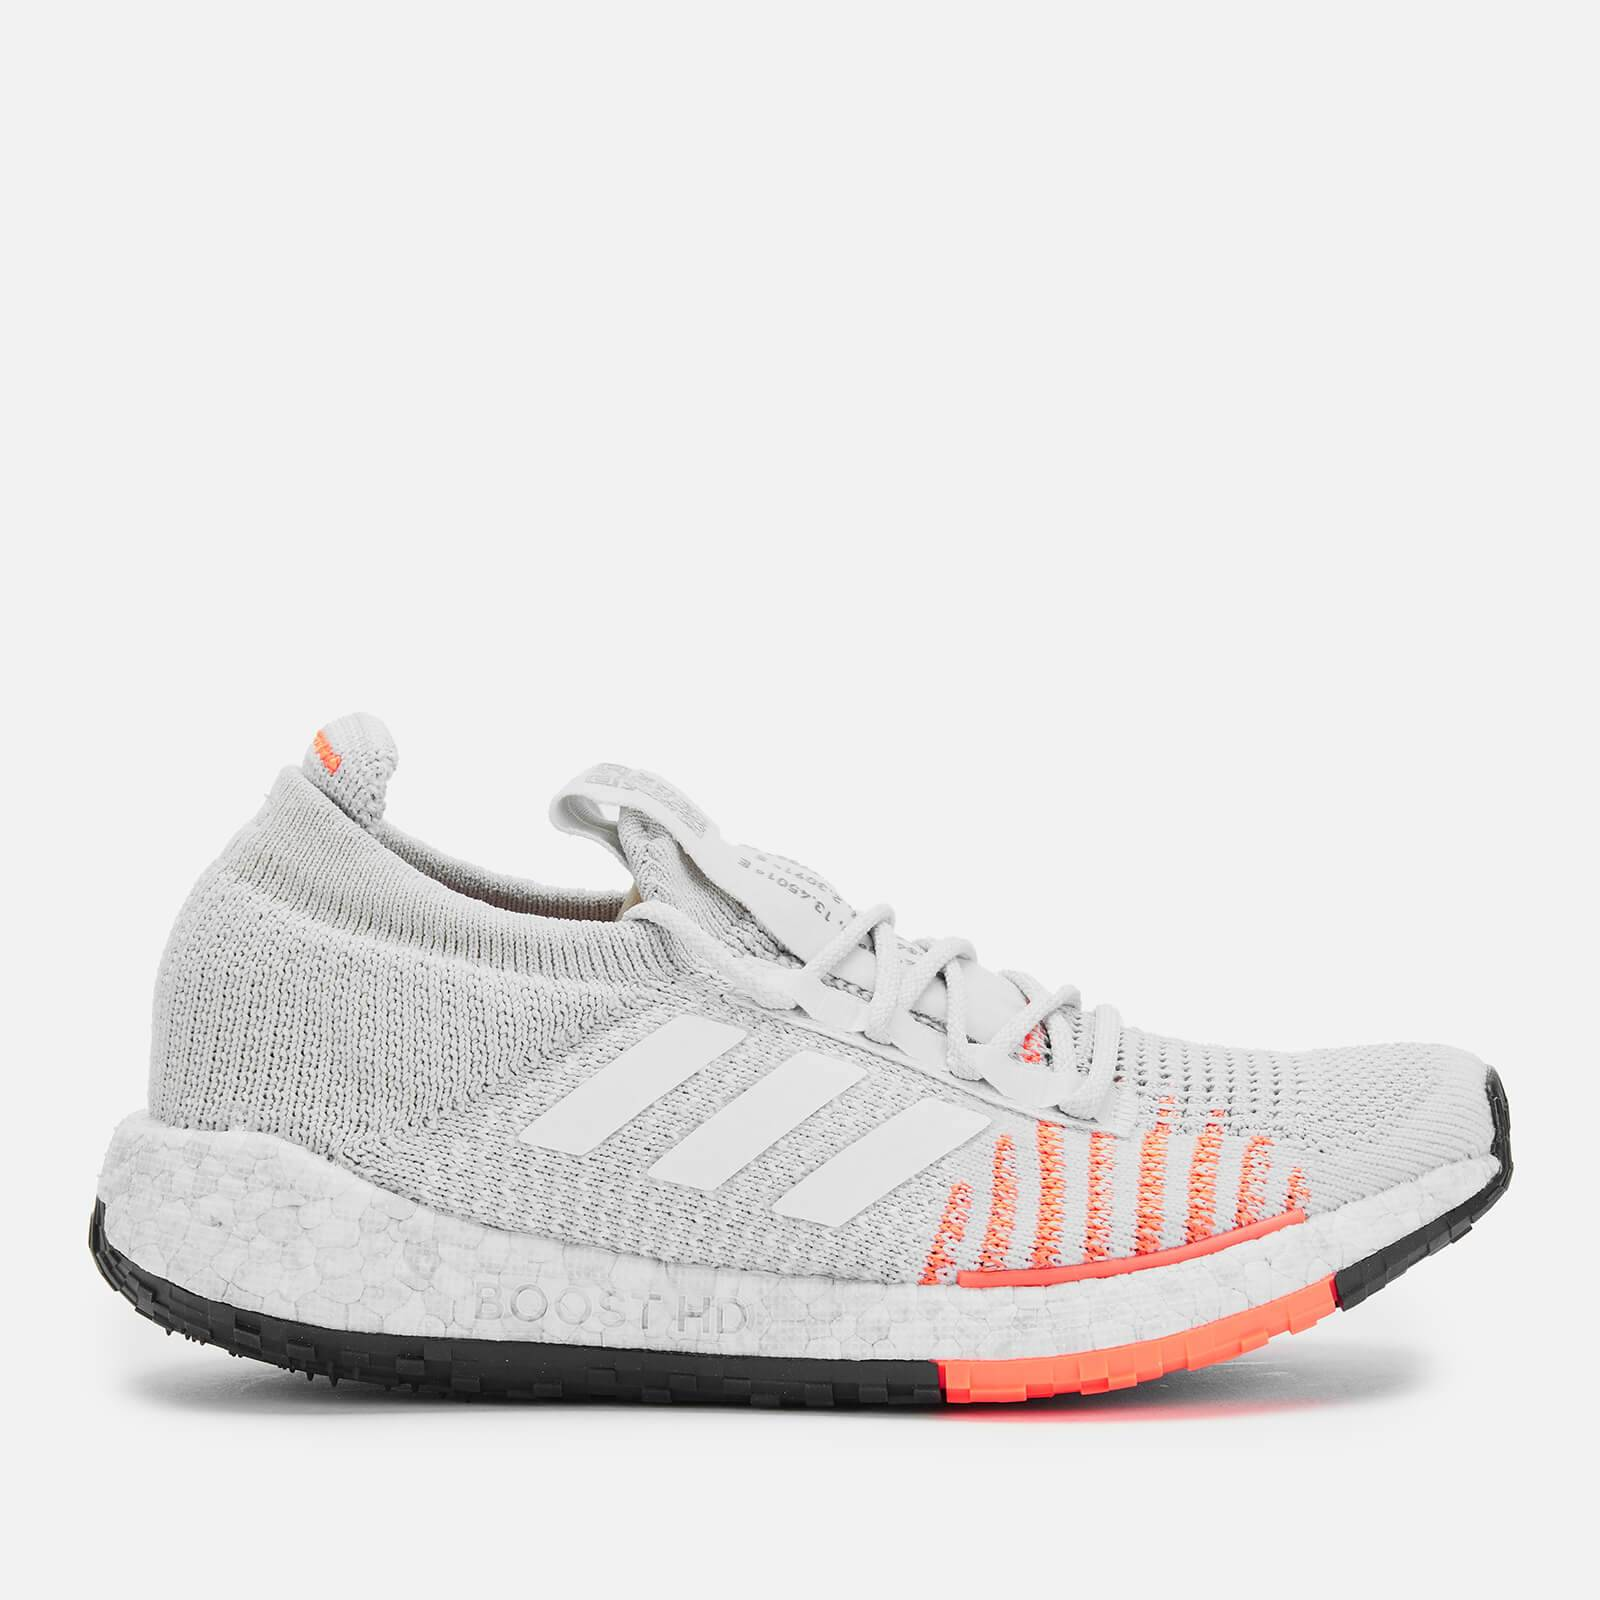 adidas Women's Pulse Boost HD Trainers - Grey/Orange - UK 8 - Grey